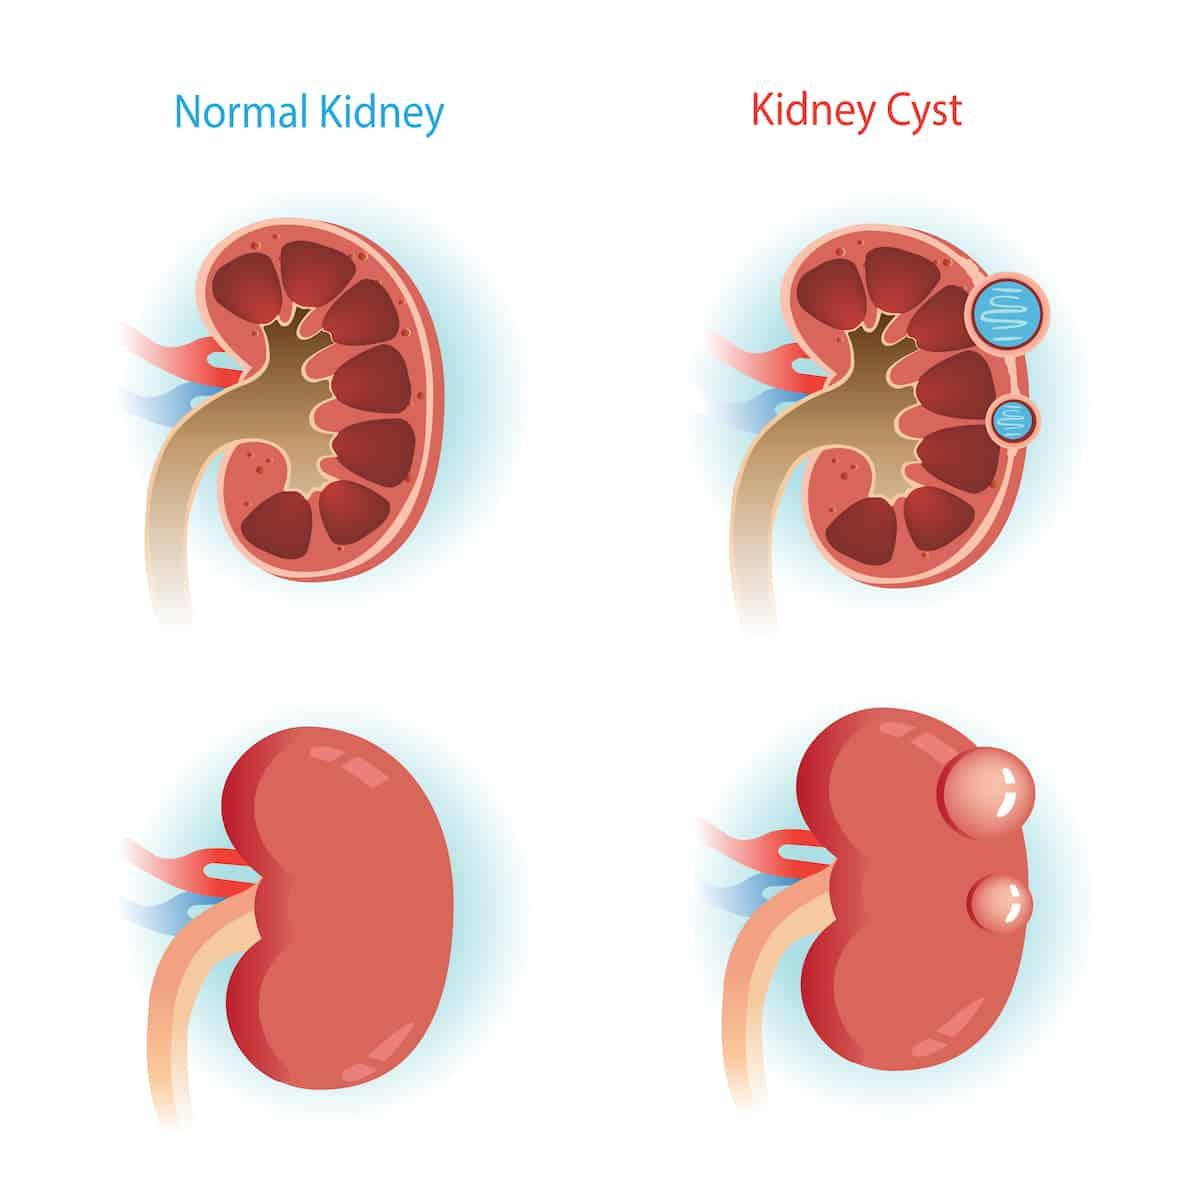 Kidney cyst